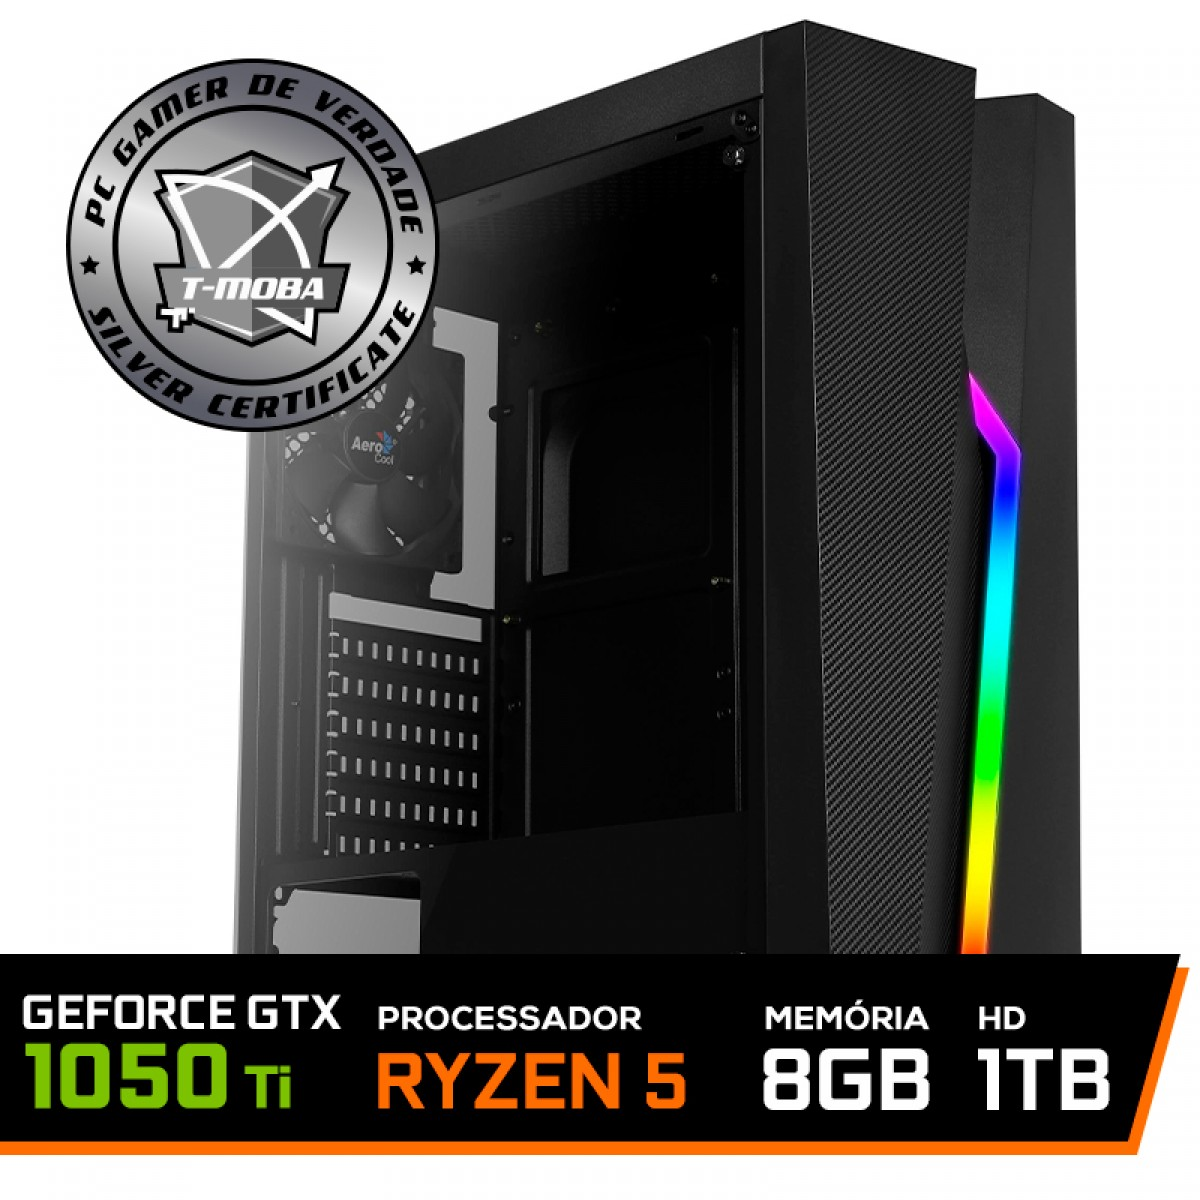 Pc Gamer T-Moba Ultimate LVL-1 AMD Ryzen 5 3400G / Geforce GTX 1050 Ti 4GB / DDR4 8GB / HD 1TB